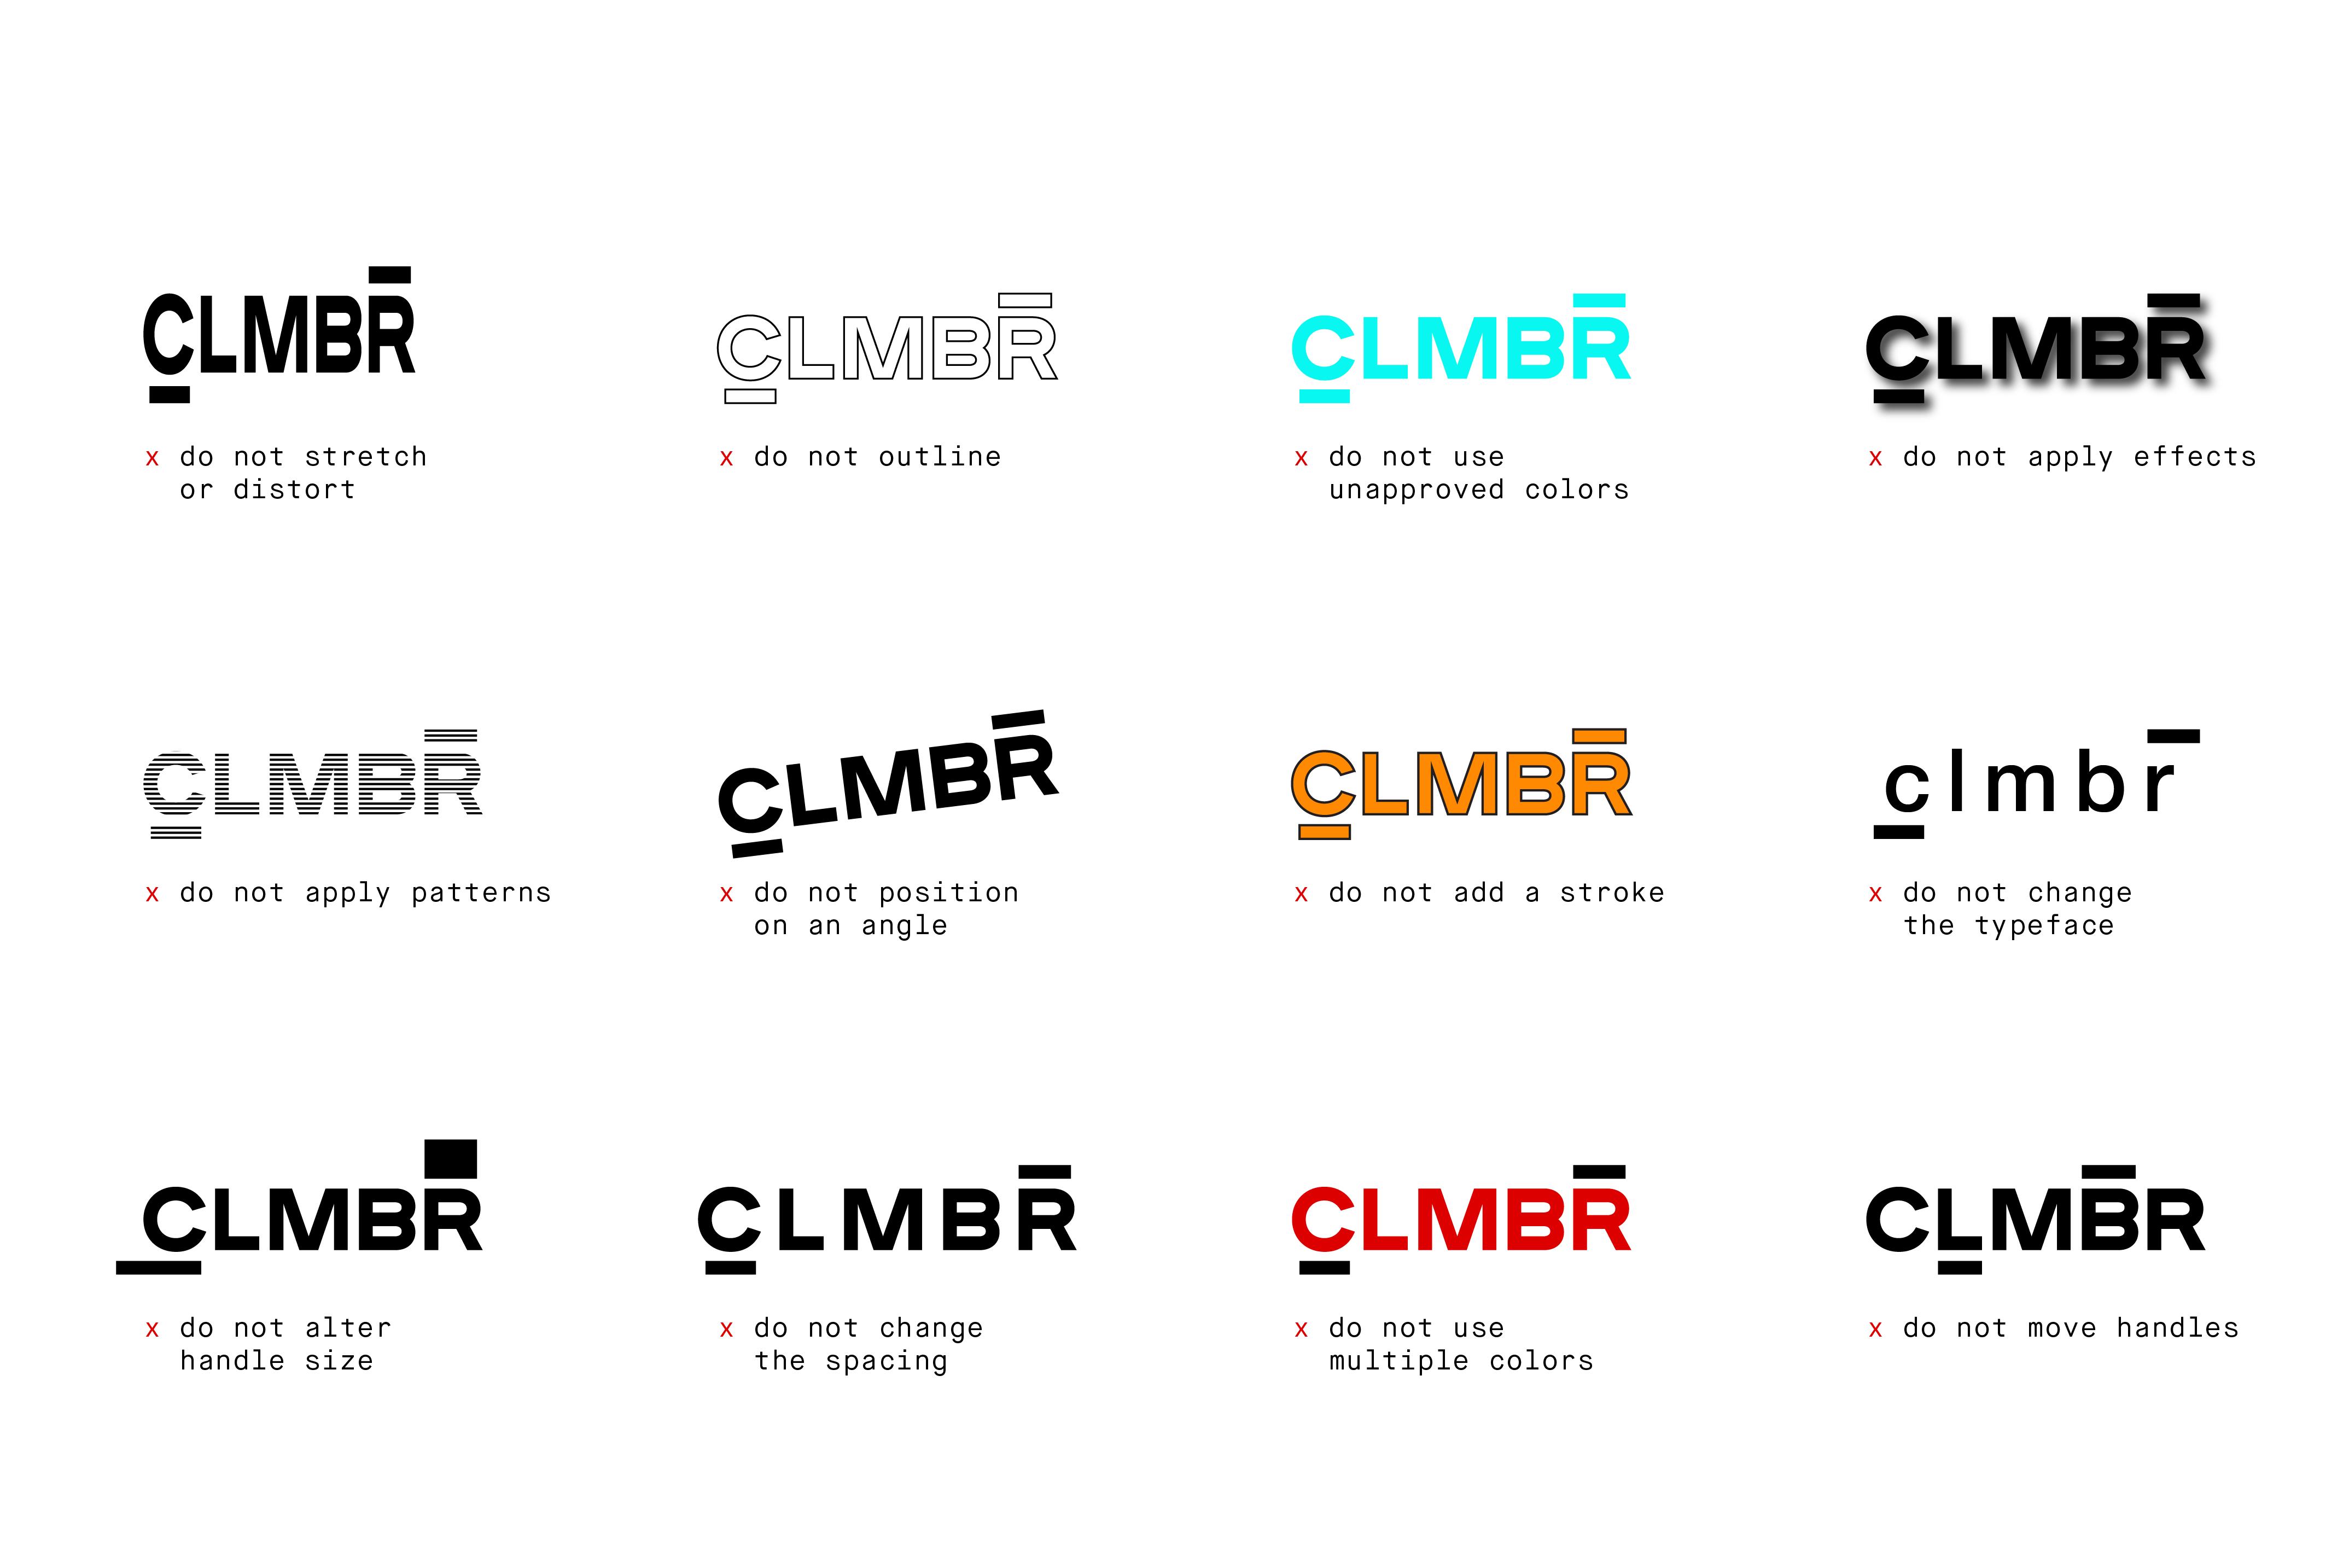 clmbr_wordmark_donts